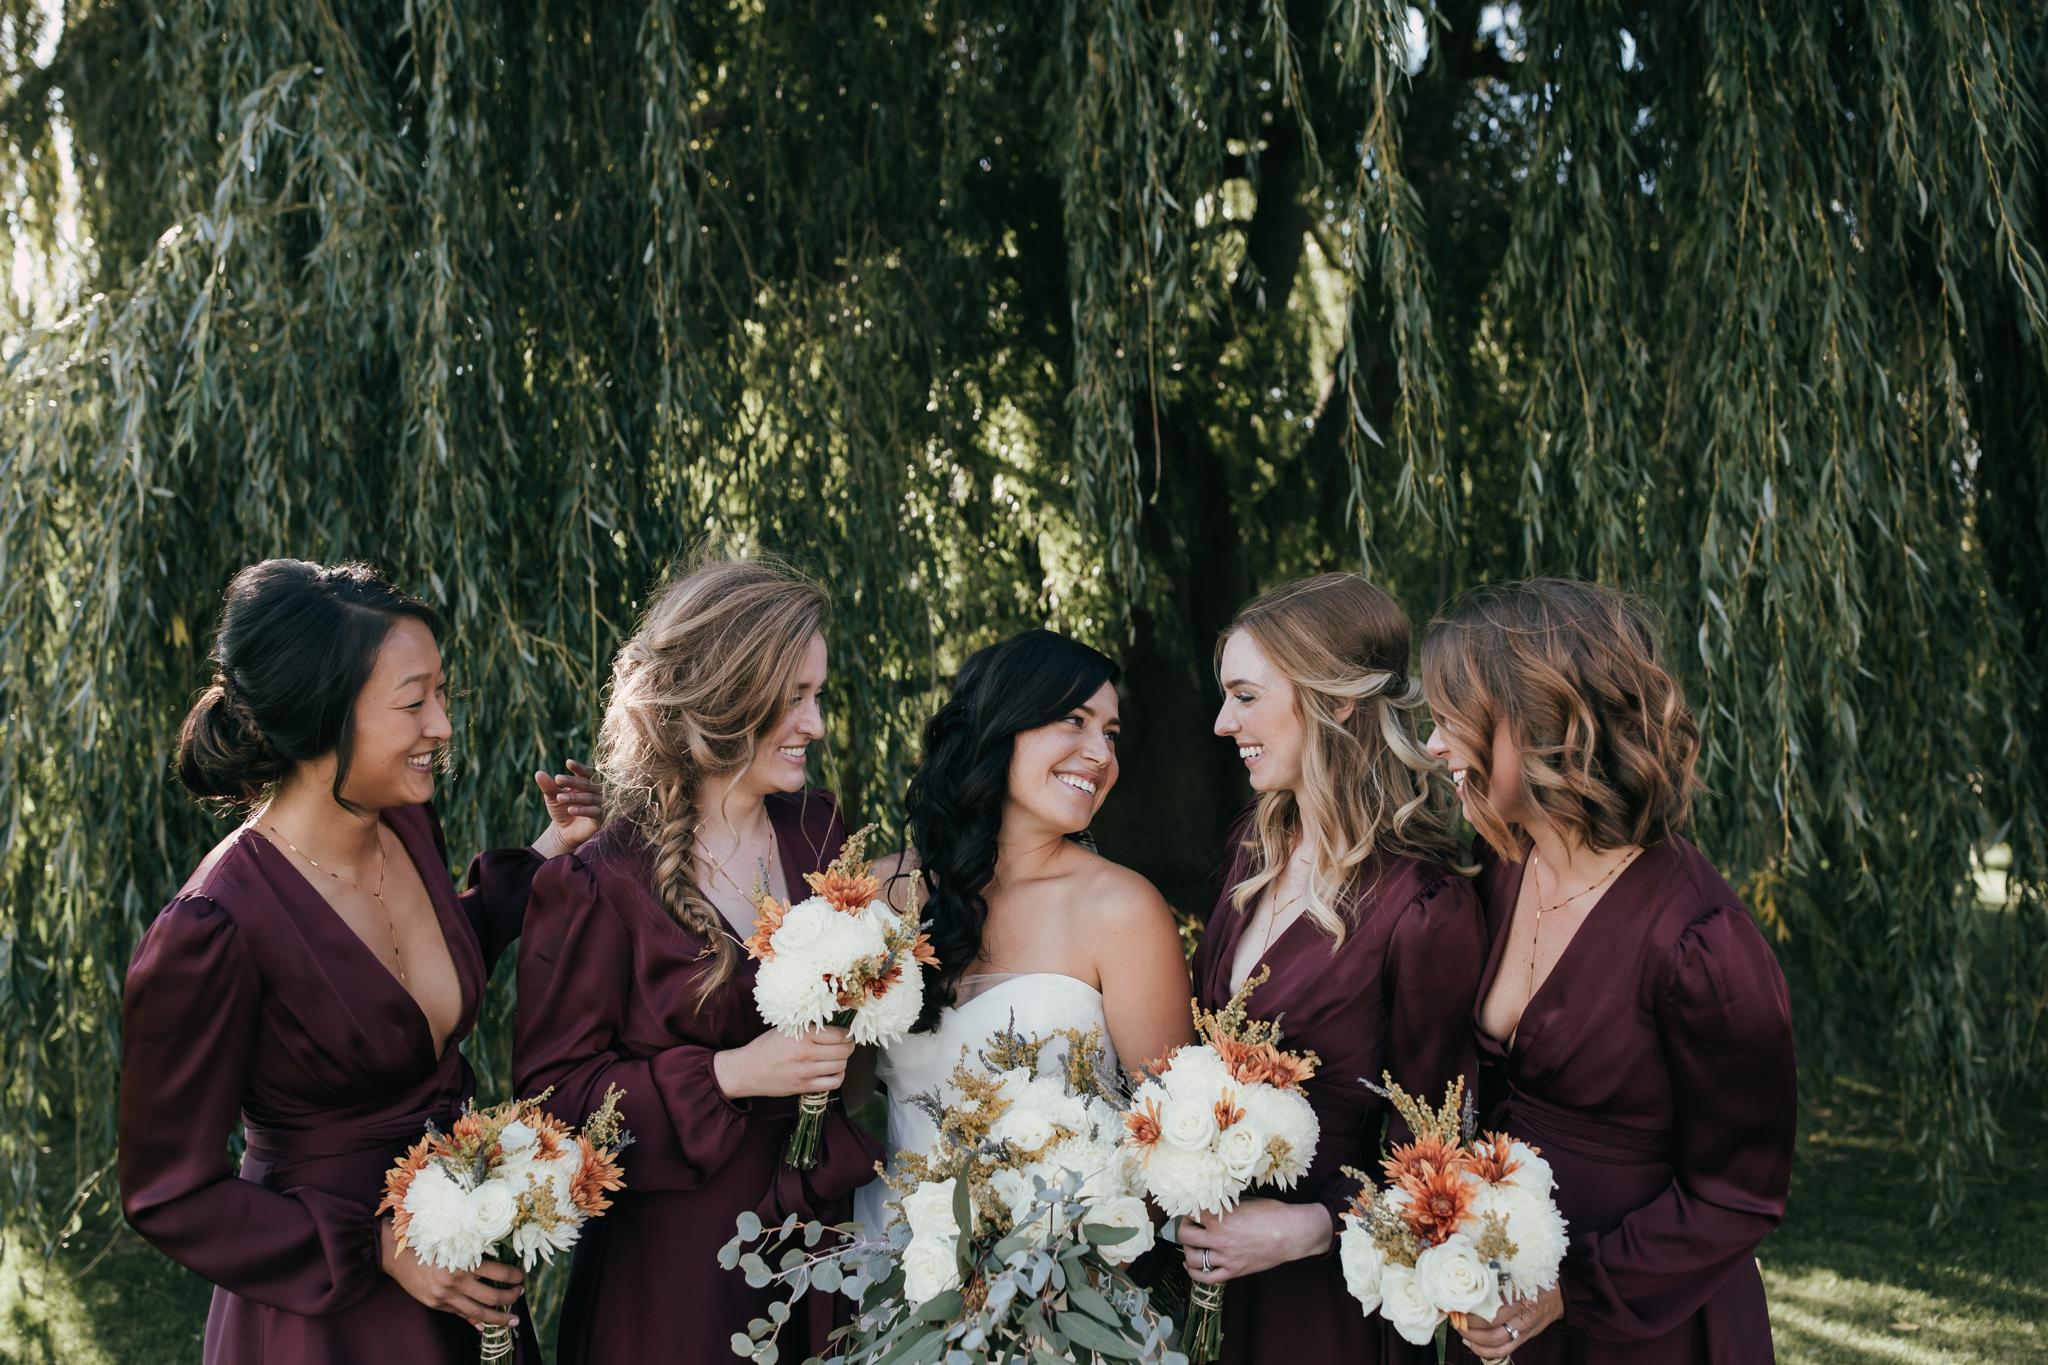 Heather-Nash-Photography-Aurora-Cellars-Wedding-Leelanau-Peninsula-Michigan_0139.jpg